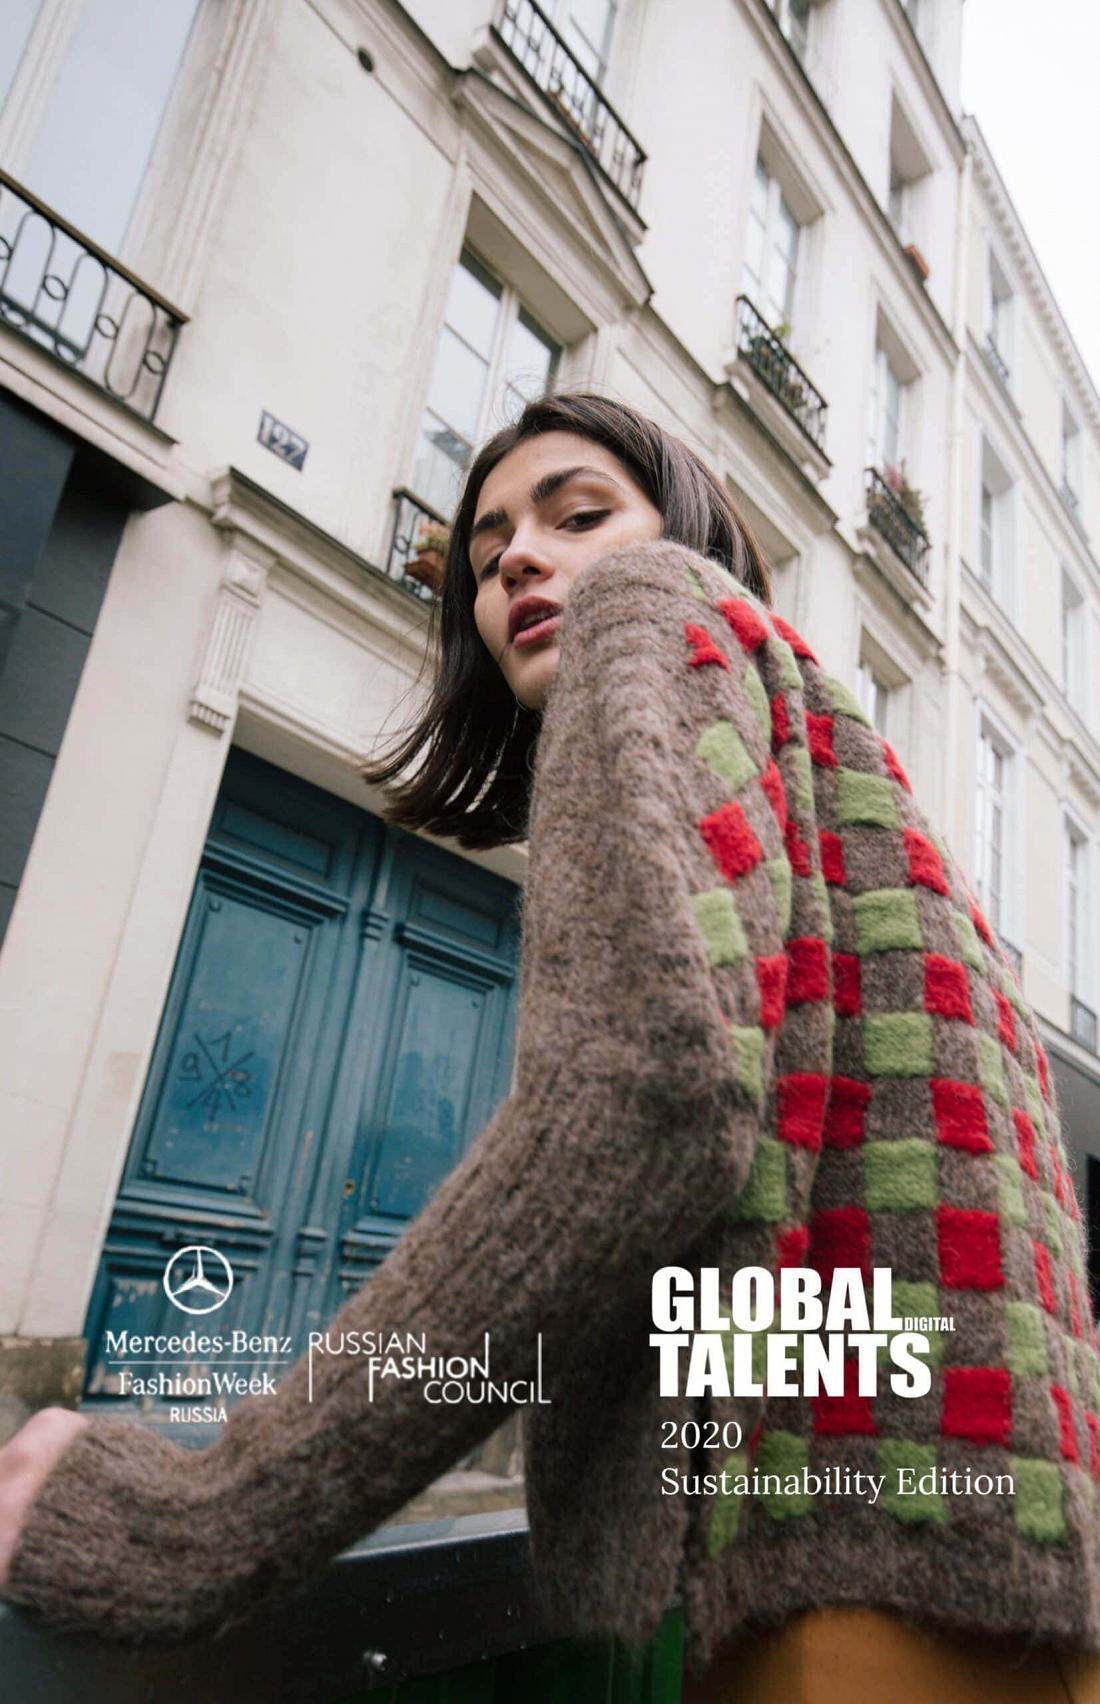 global talents digital 2020c